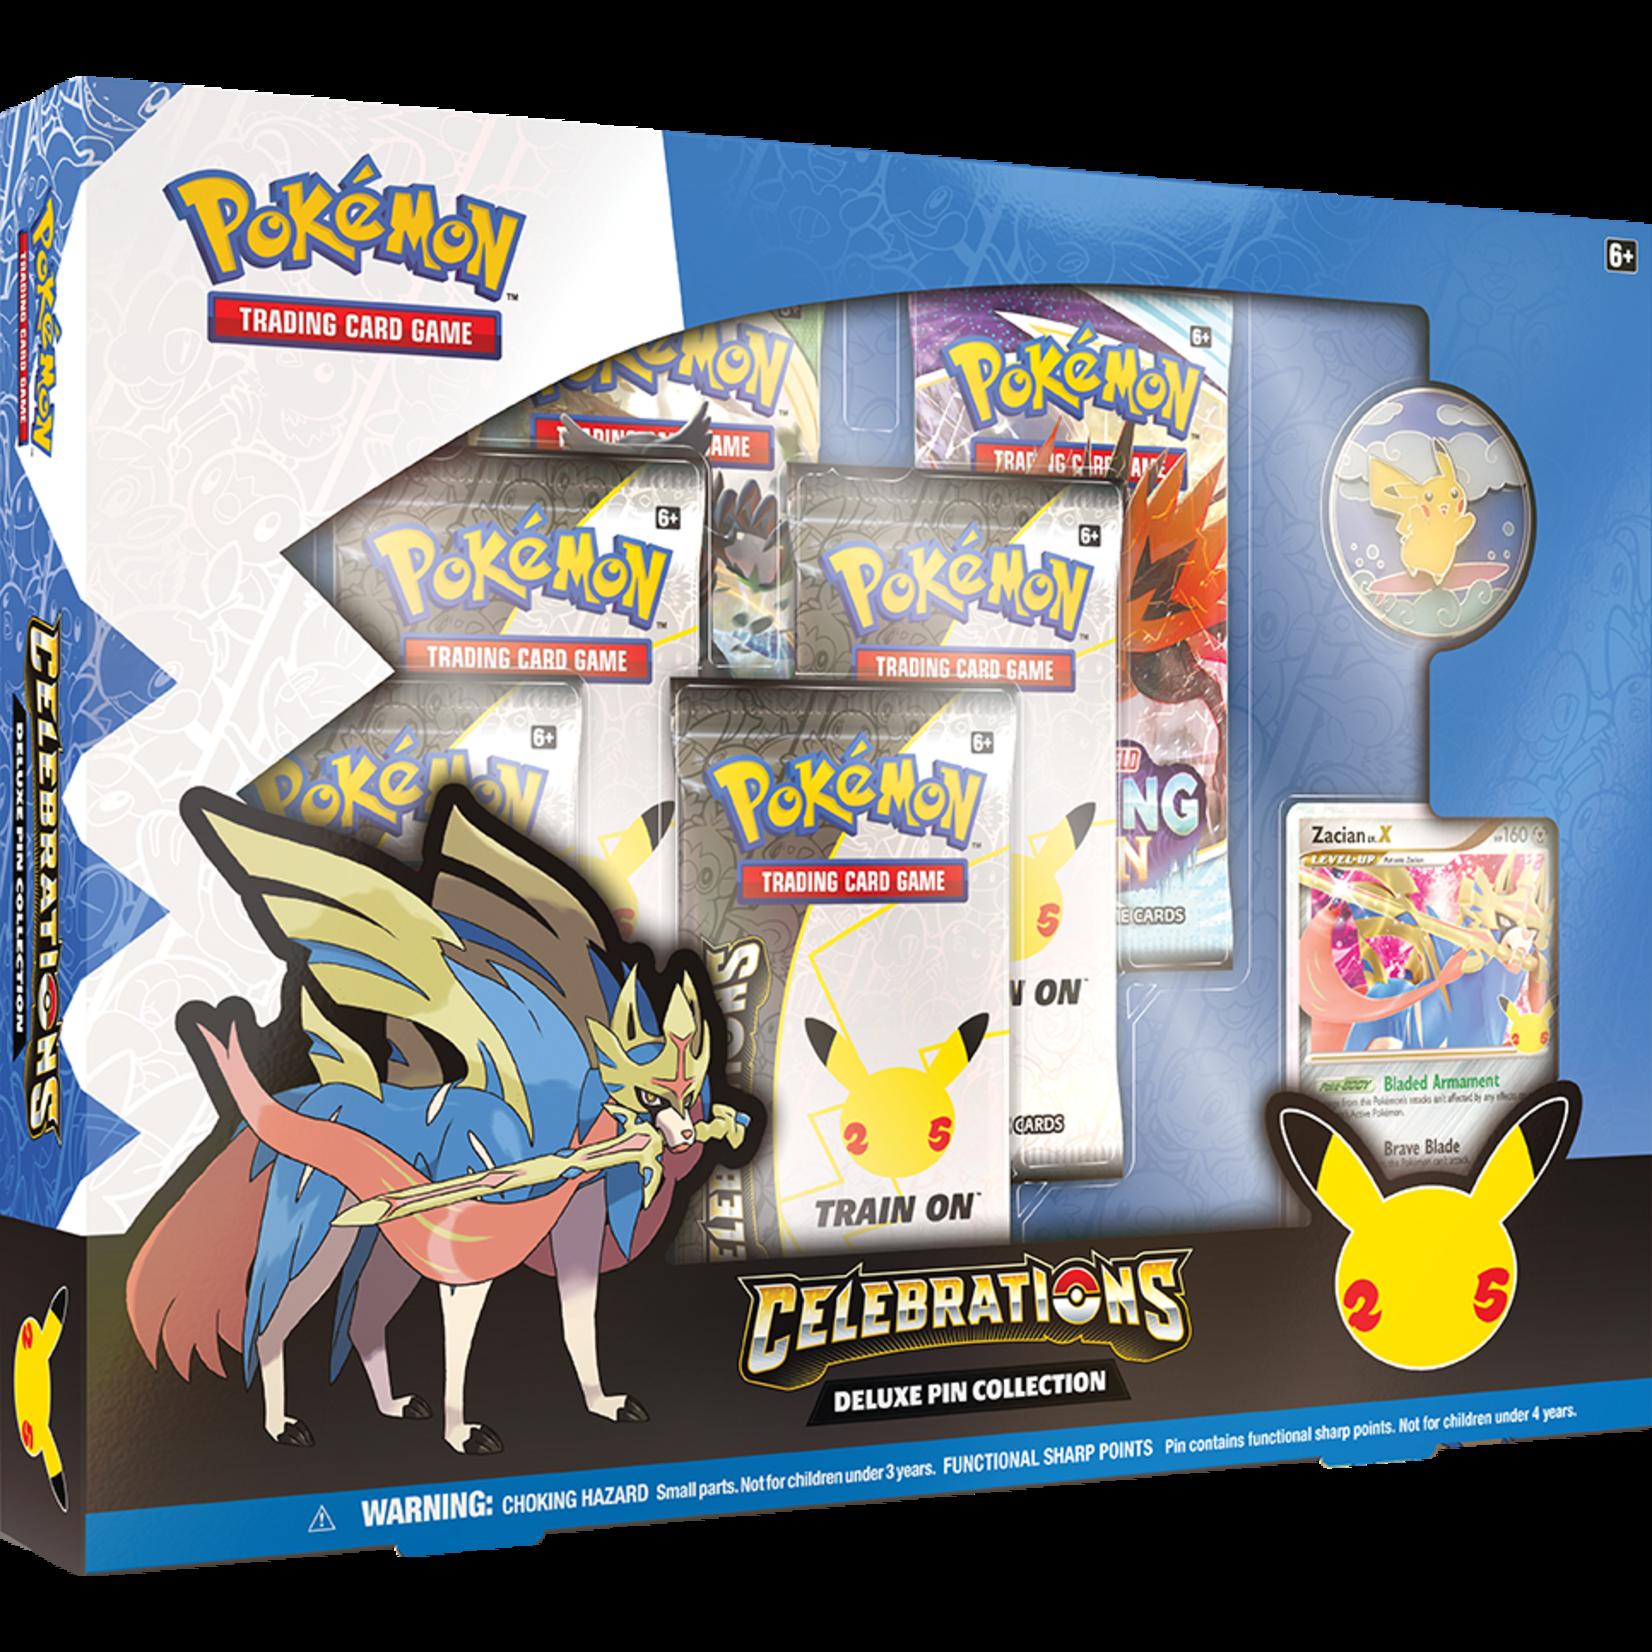 Pokémon Pokémon TCG: Celebrations Deluxe Pin Collection